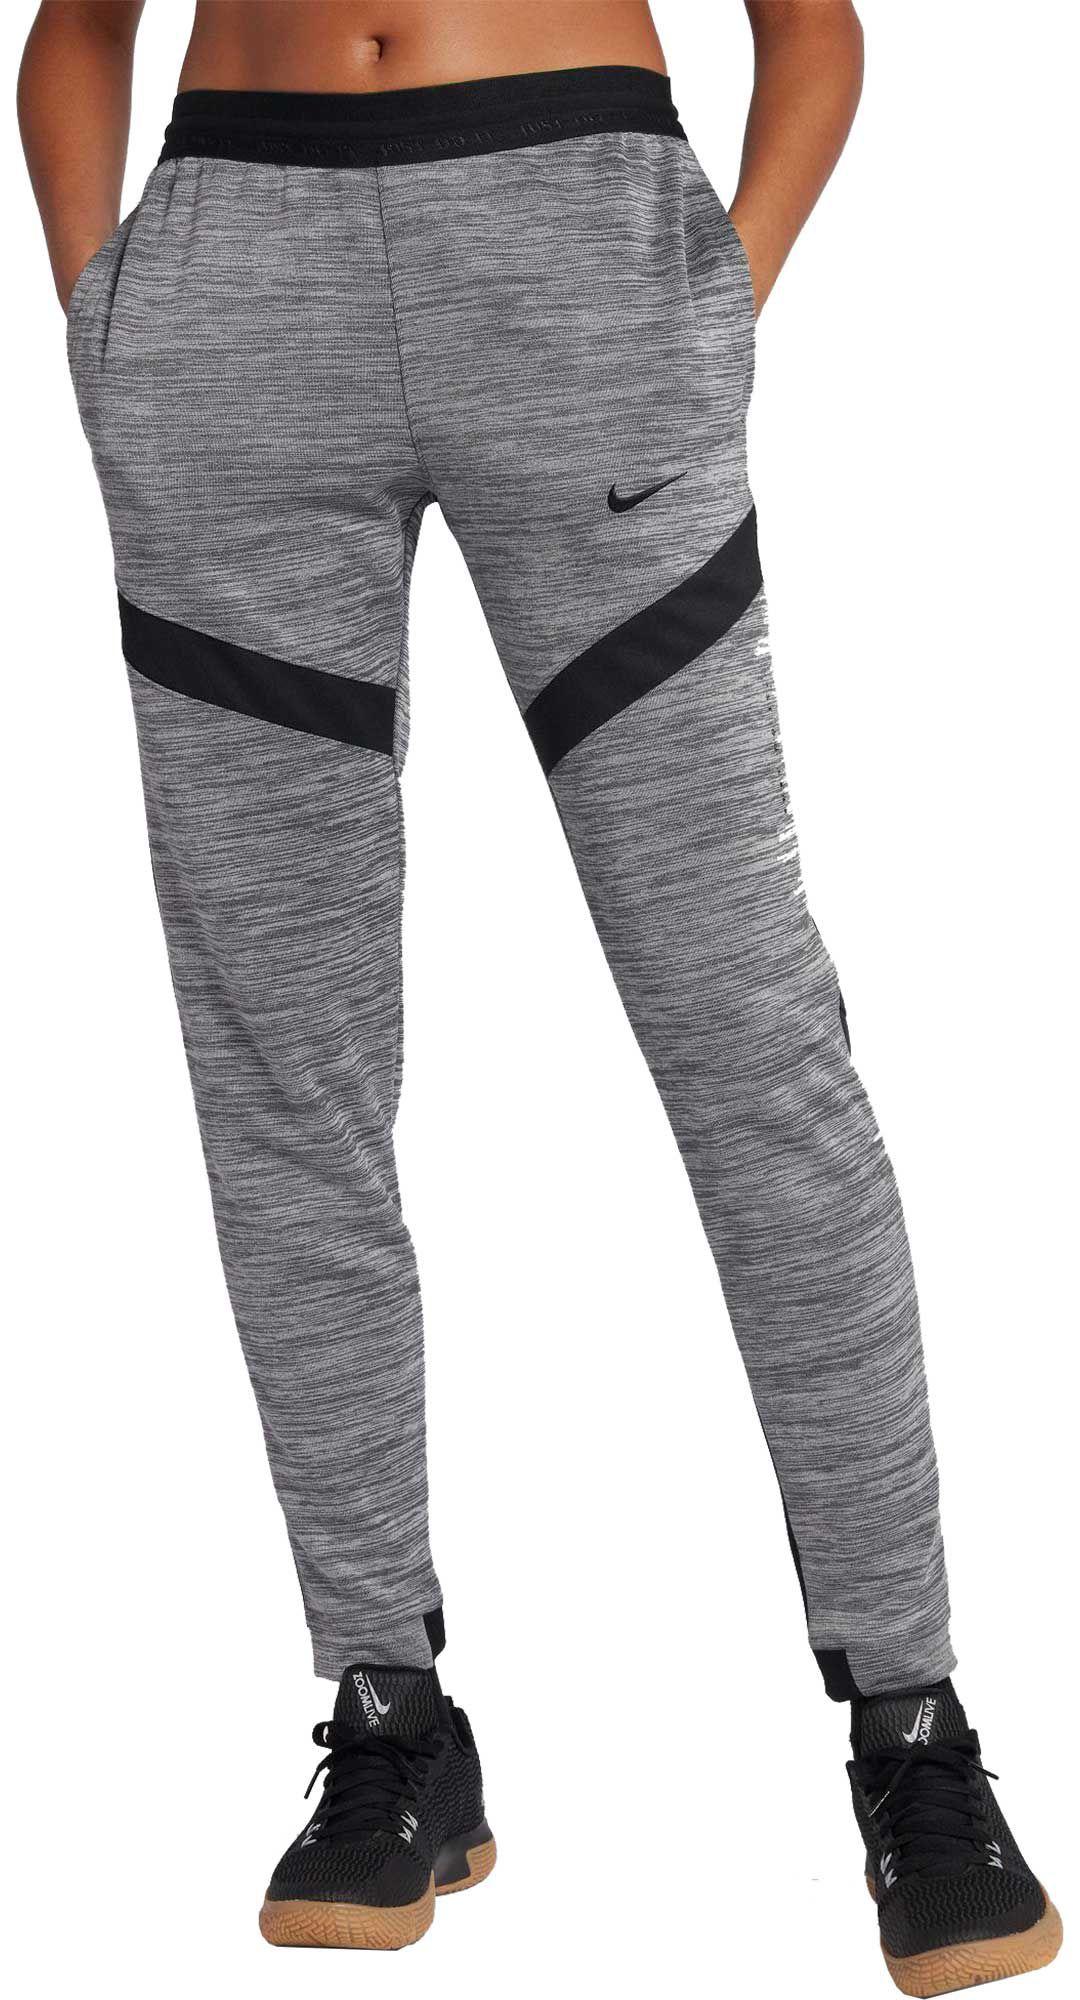 1585e7fd8a0e1 Nike Women's Spotlight Basketball Pants. noImageFound. Previous